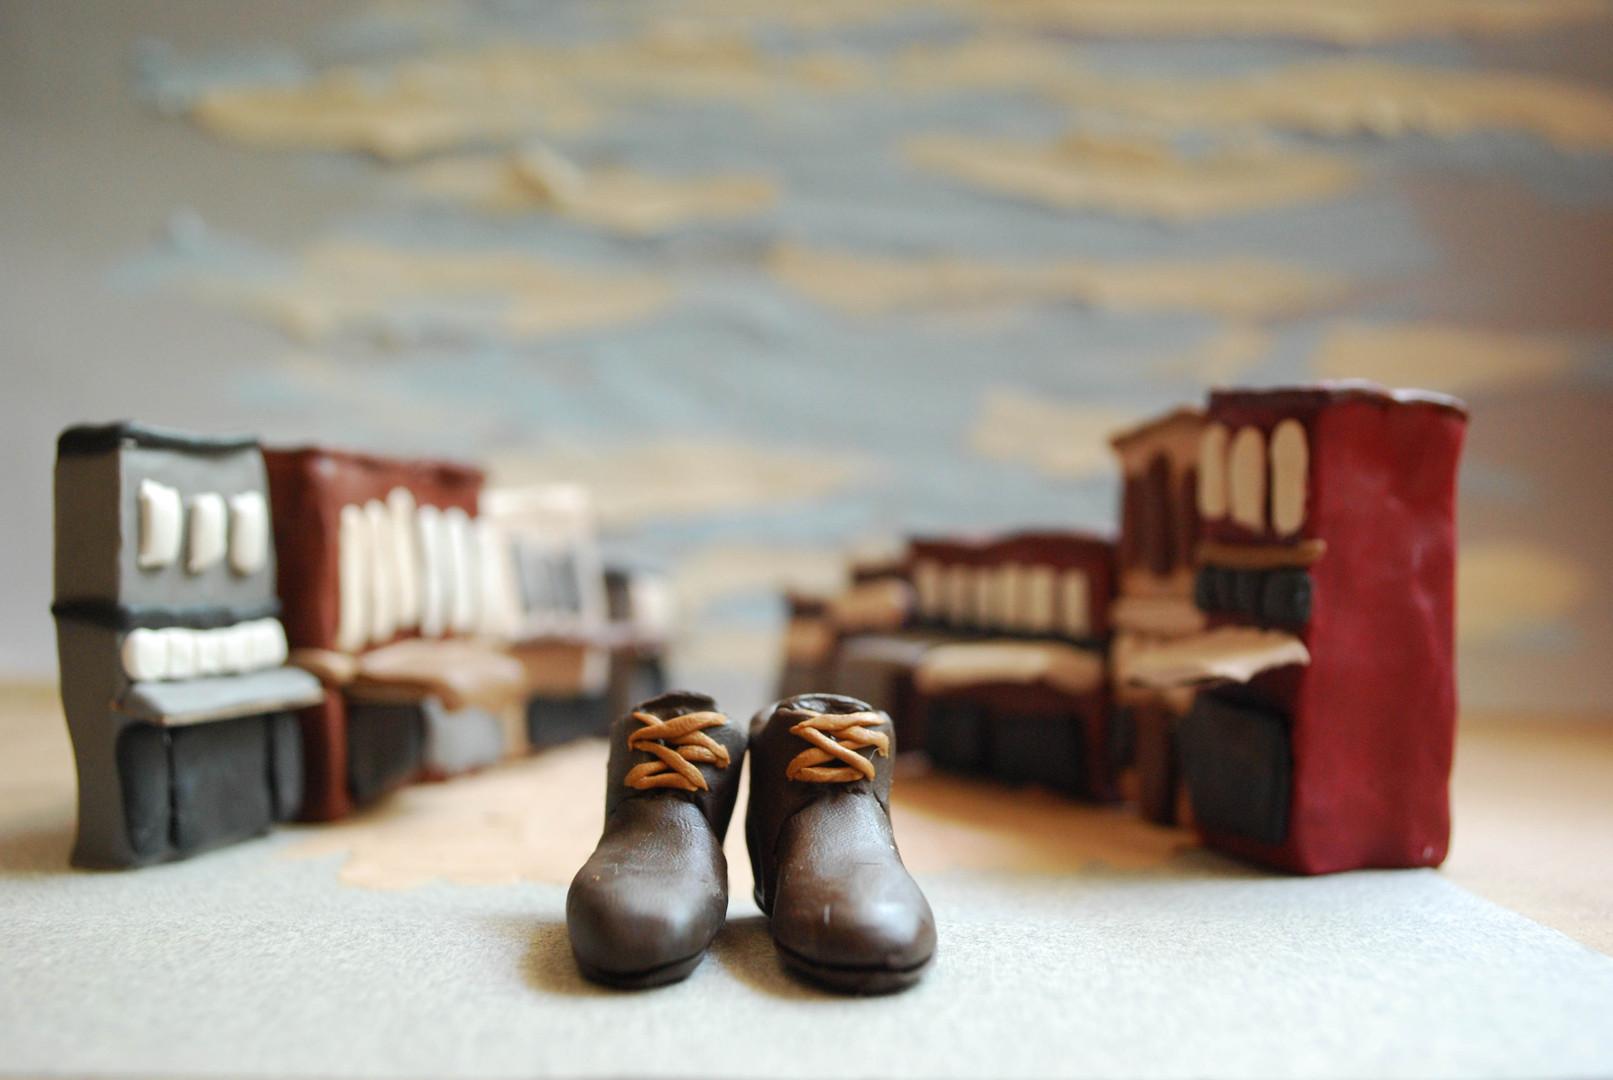 american aquarium shoes (1 of 1).jpg